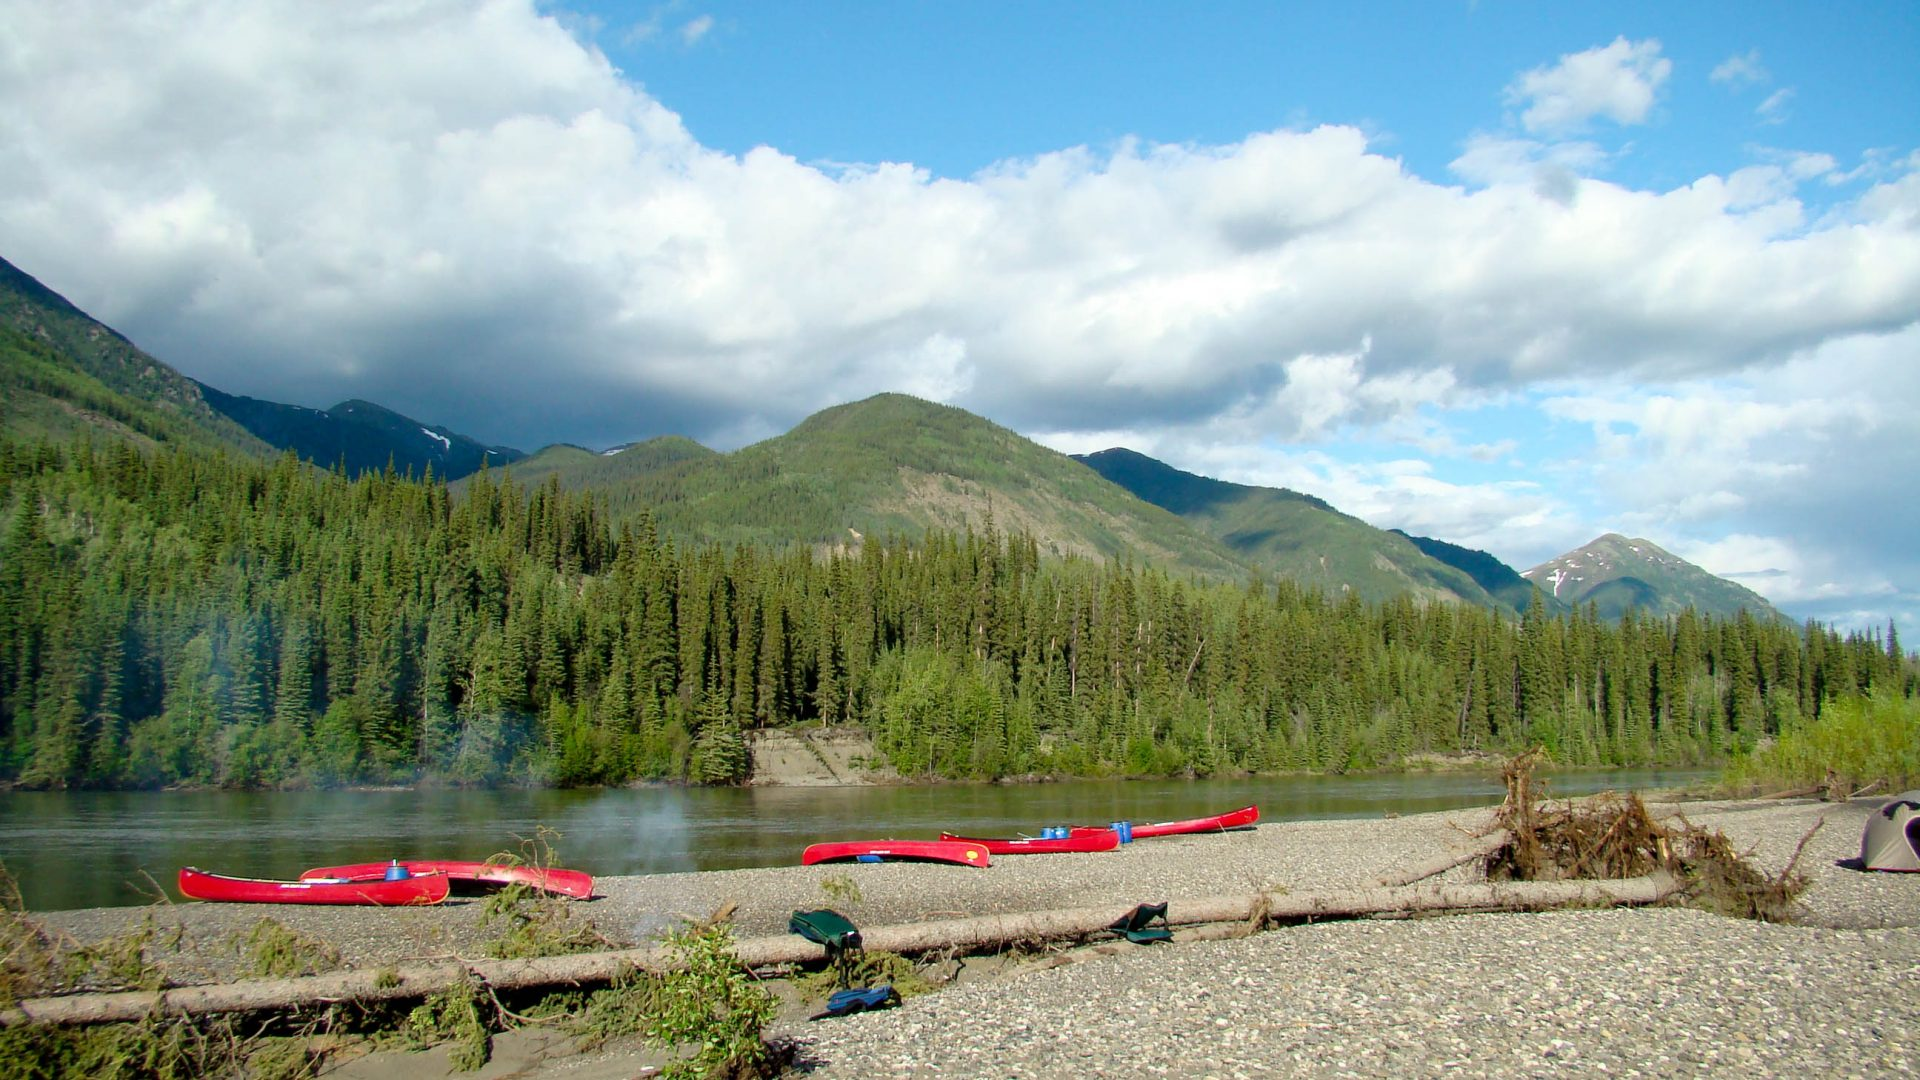 Spirit of the Yukon- Teslin River Canoe trip rest